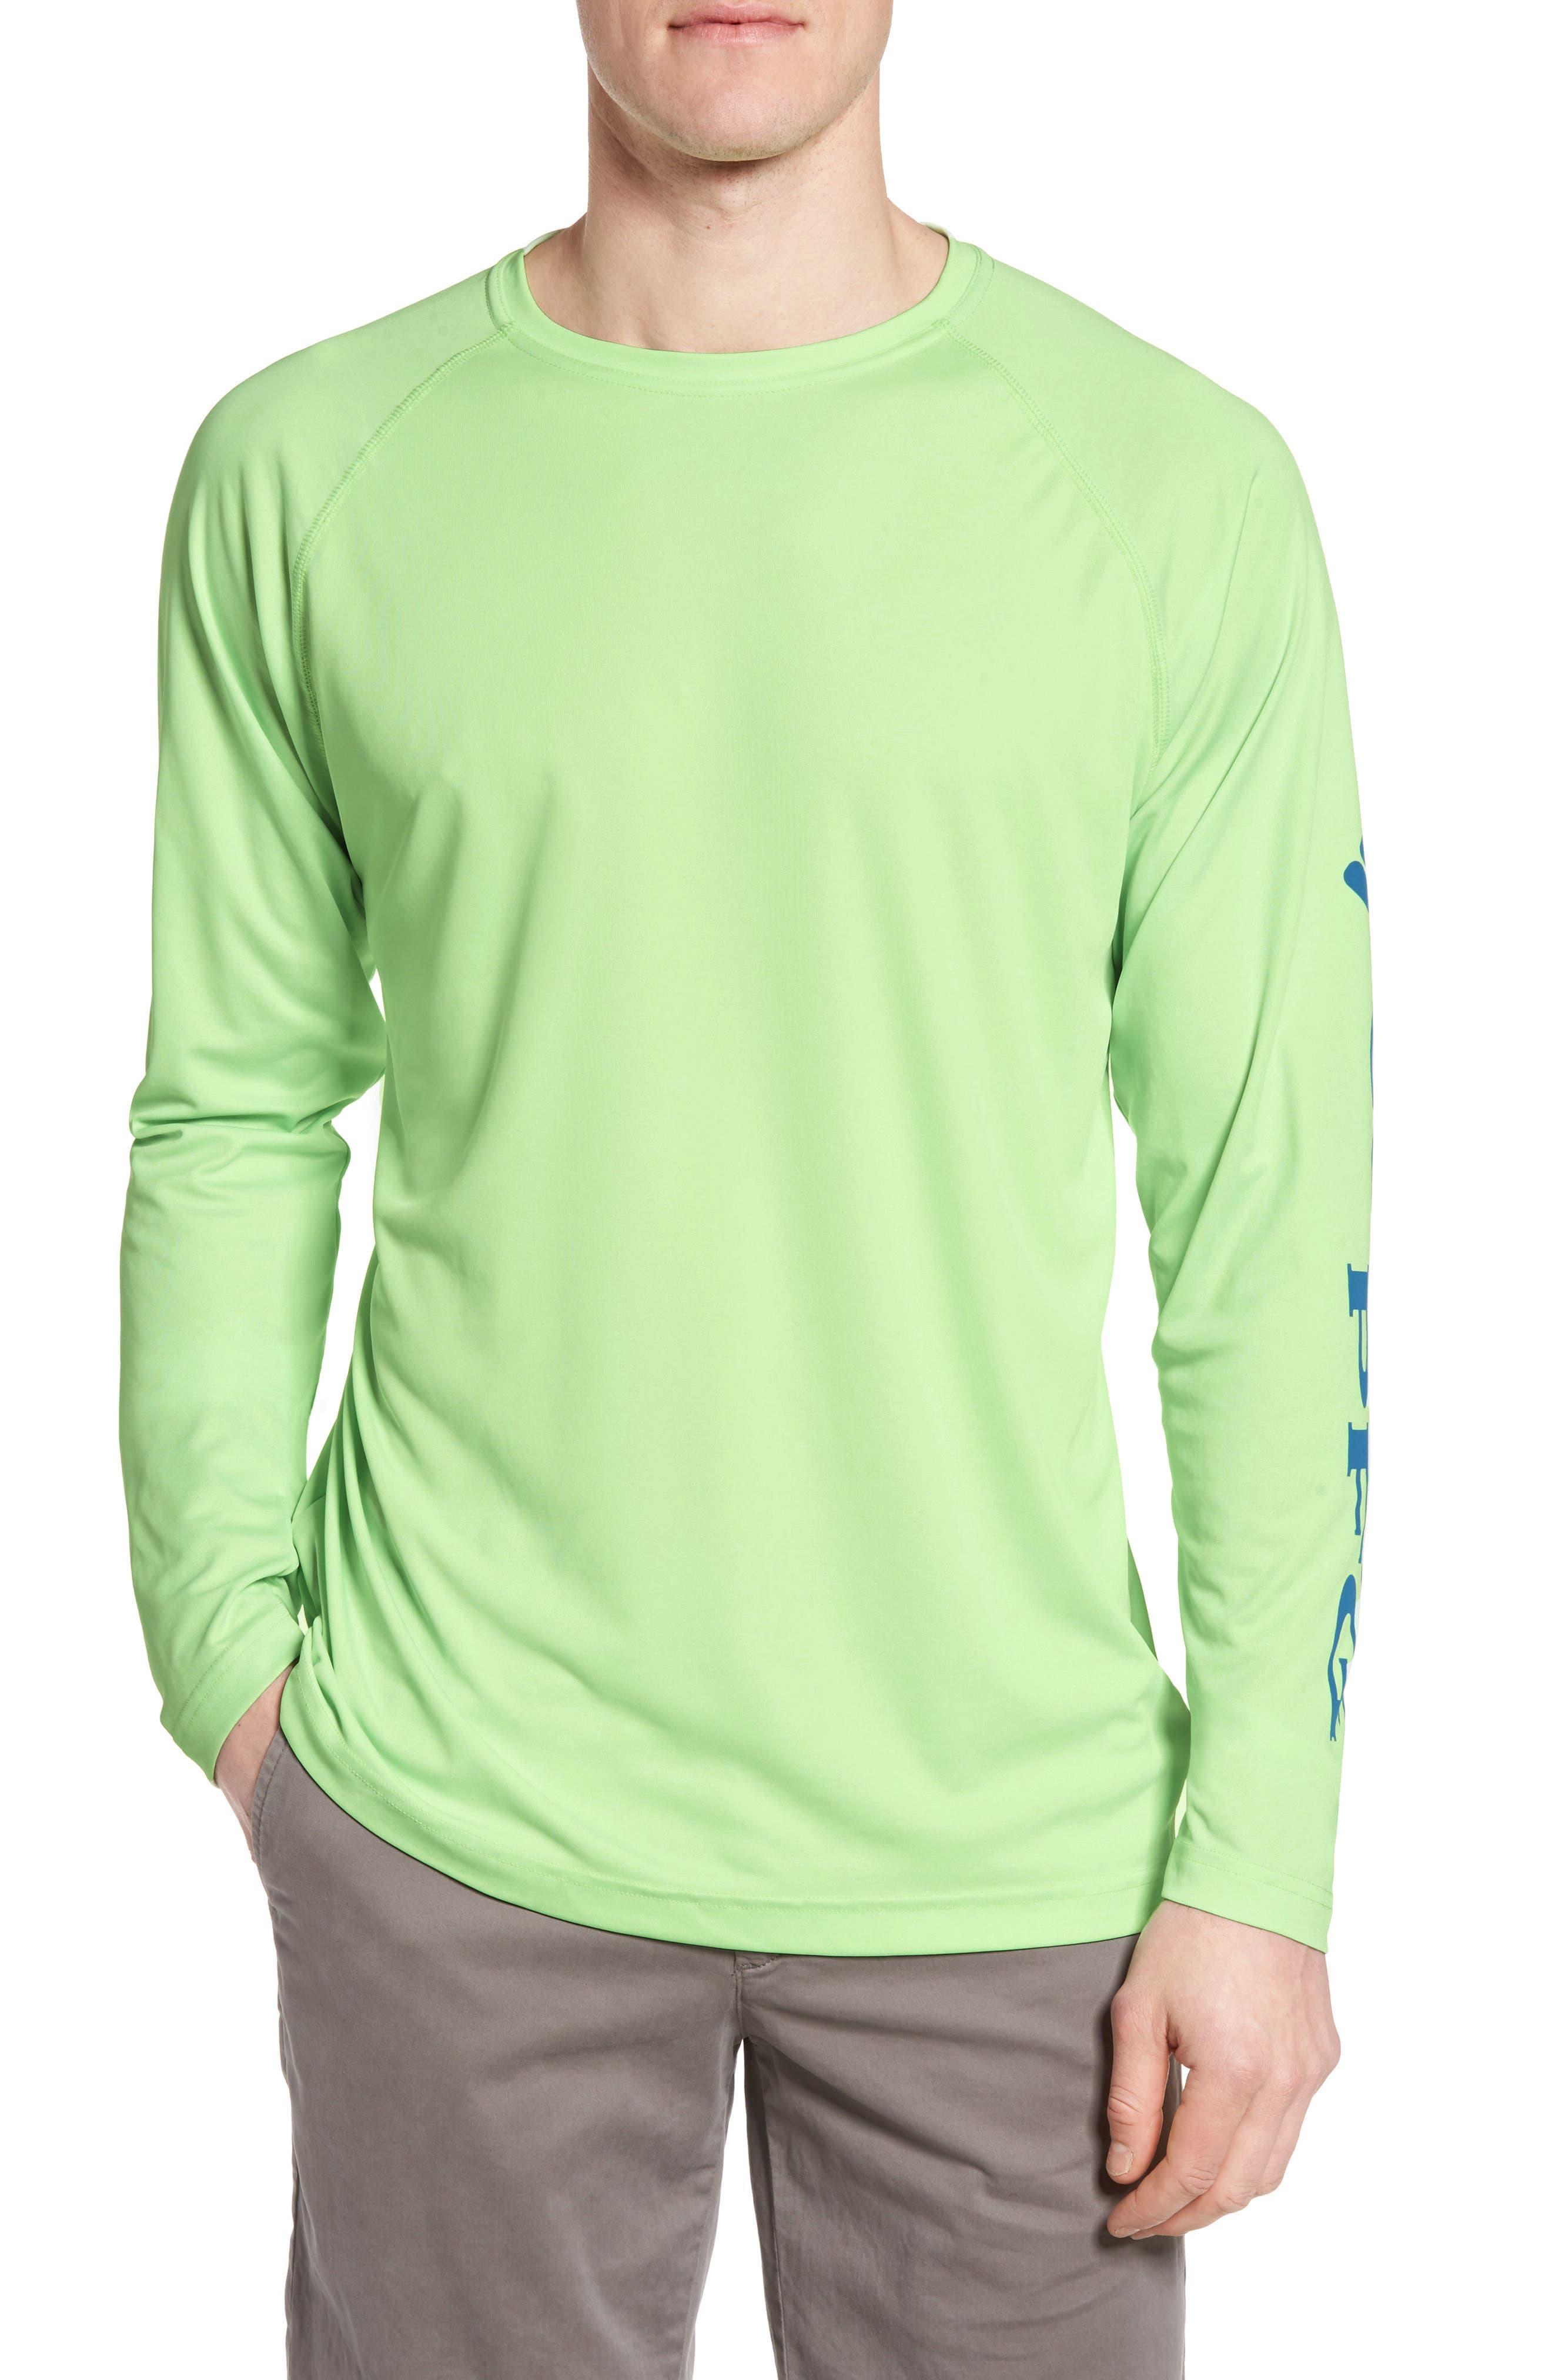 Alternate Image 1 Selected - Columbia PFG Terminal Tackle Performance T-Shirt